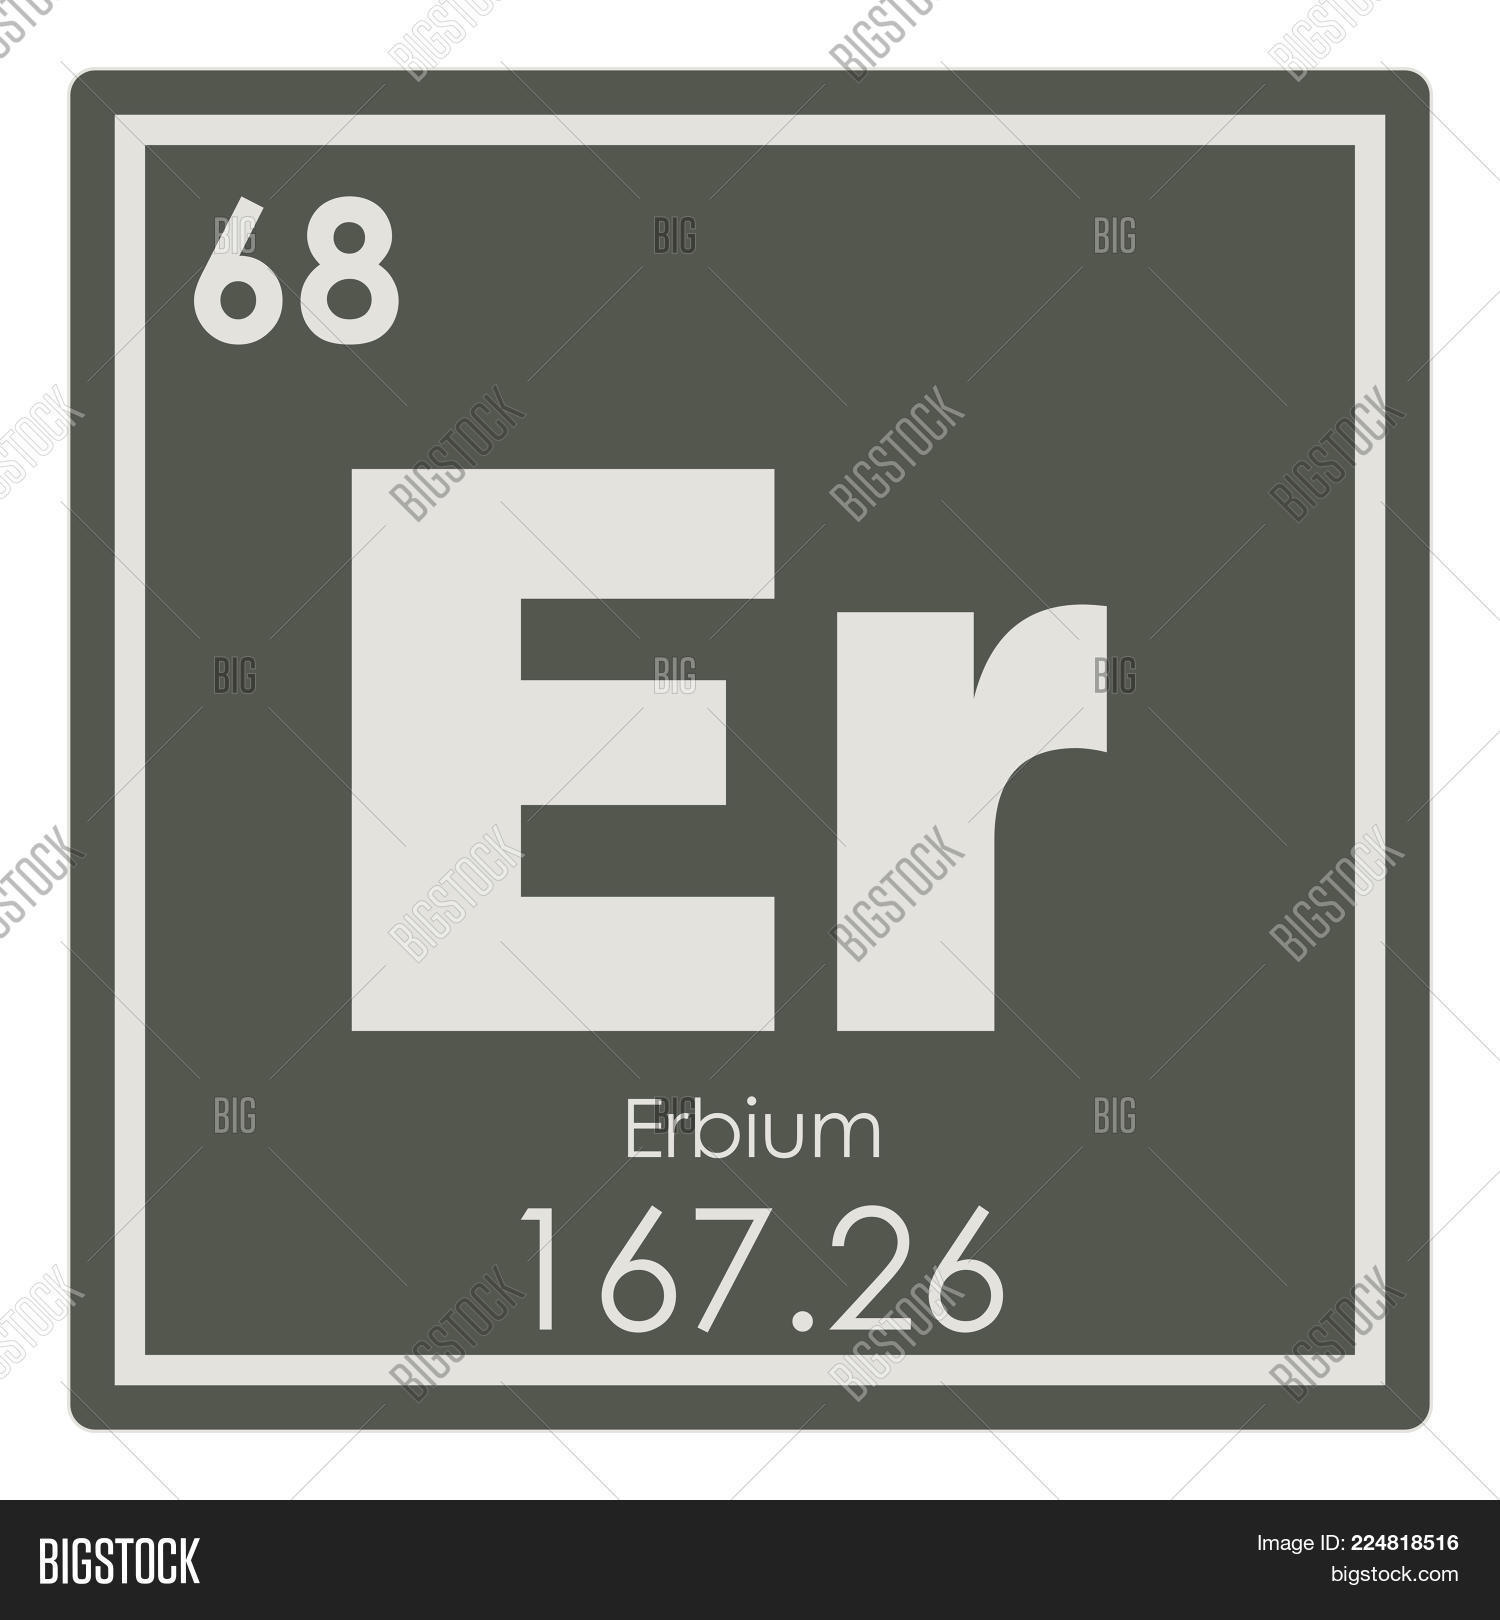 Erbium Chemical Image Photo Free Trial Bigstock